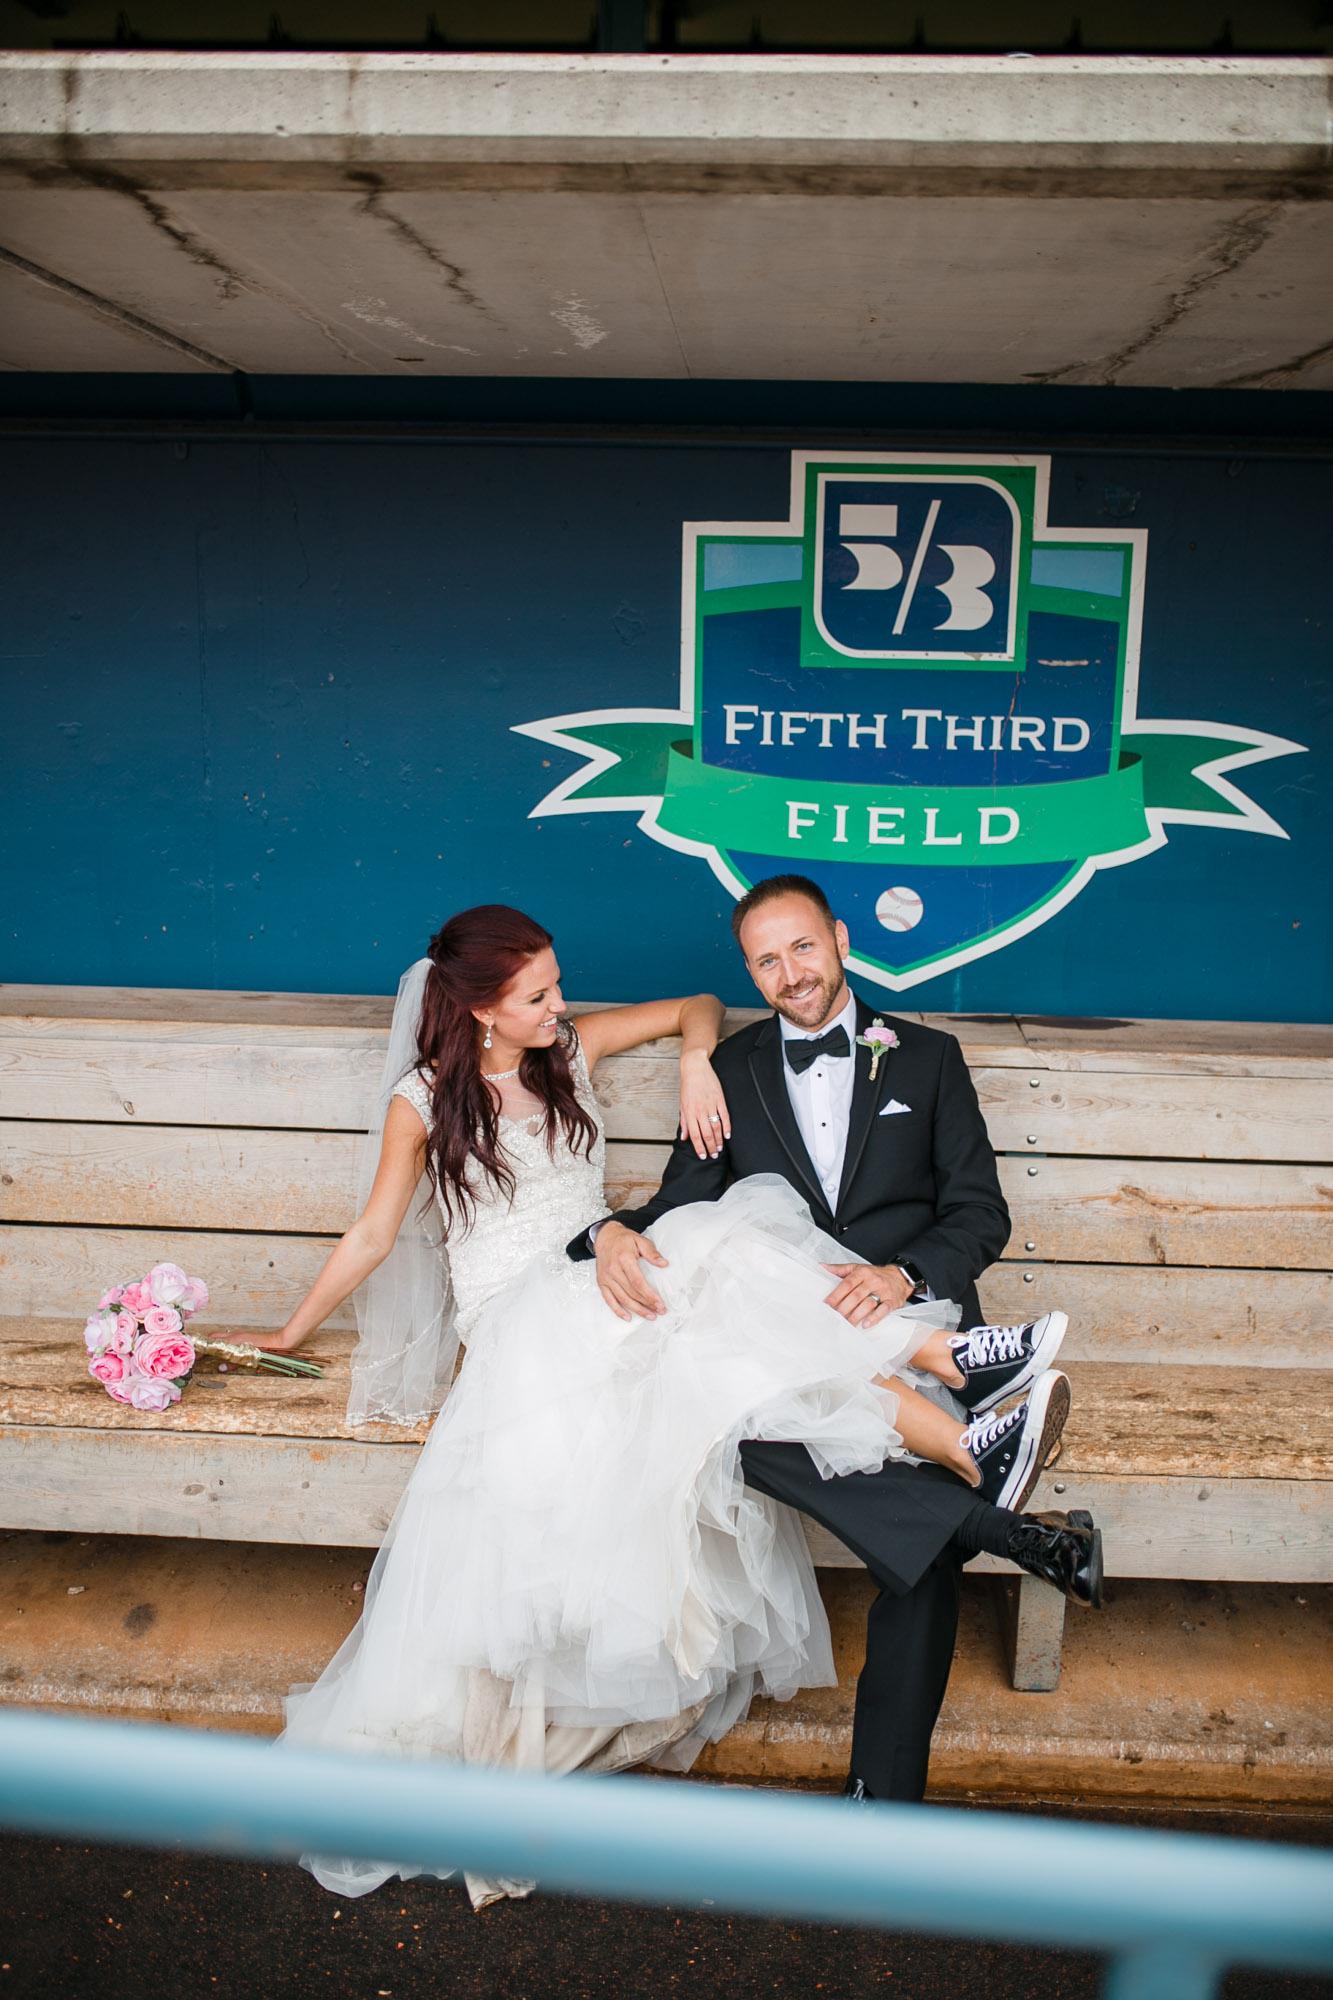 hensville-wedding-downtown-toledo-ohio (85 of 103).jpg